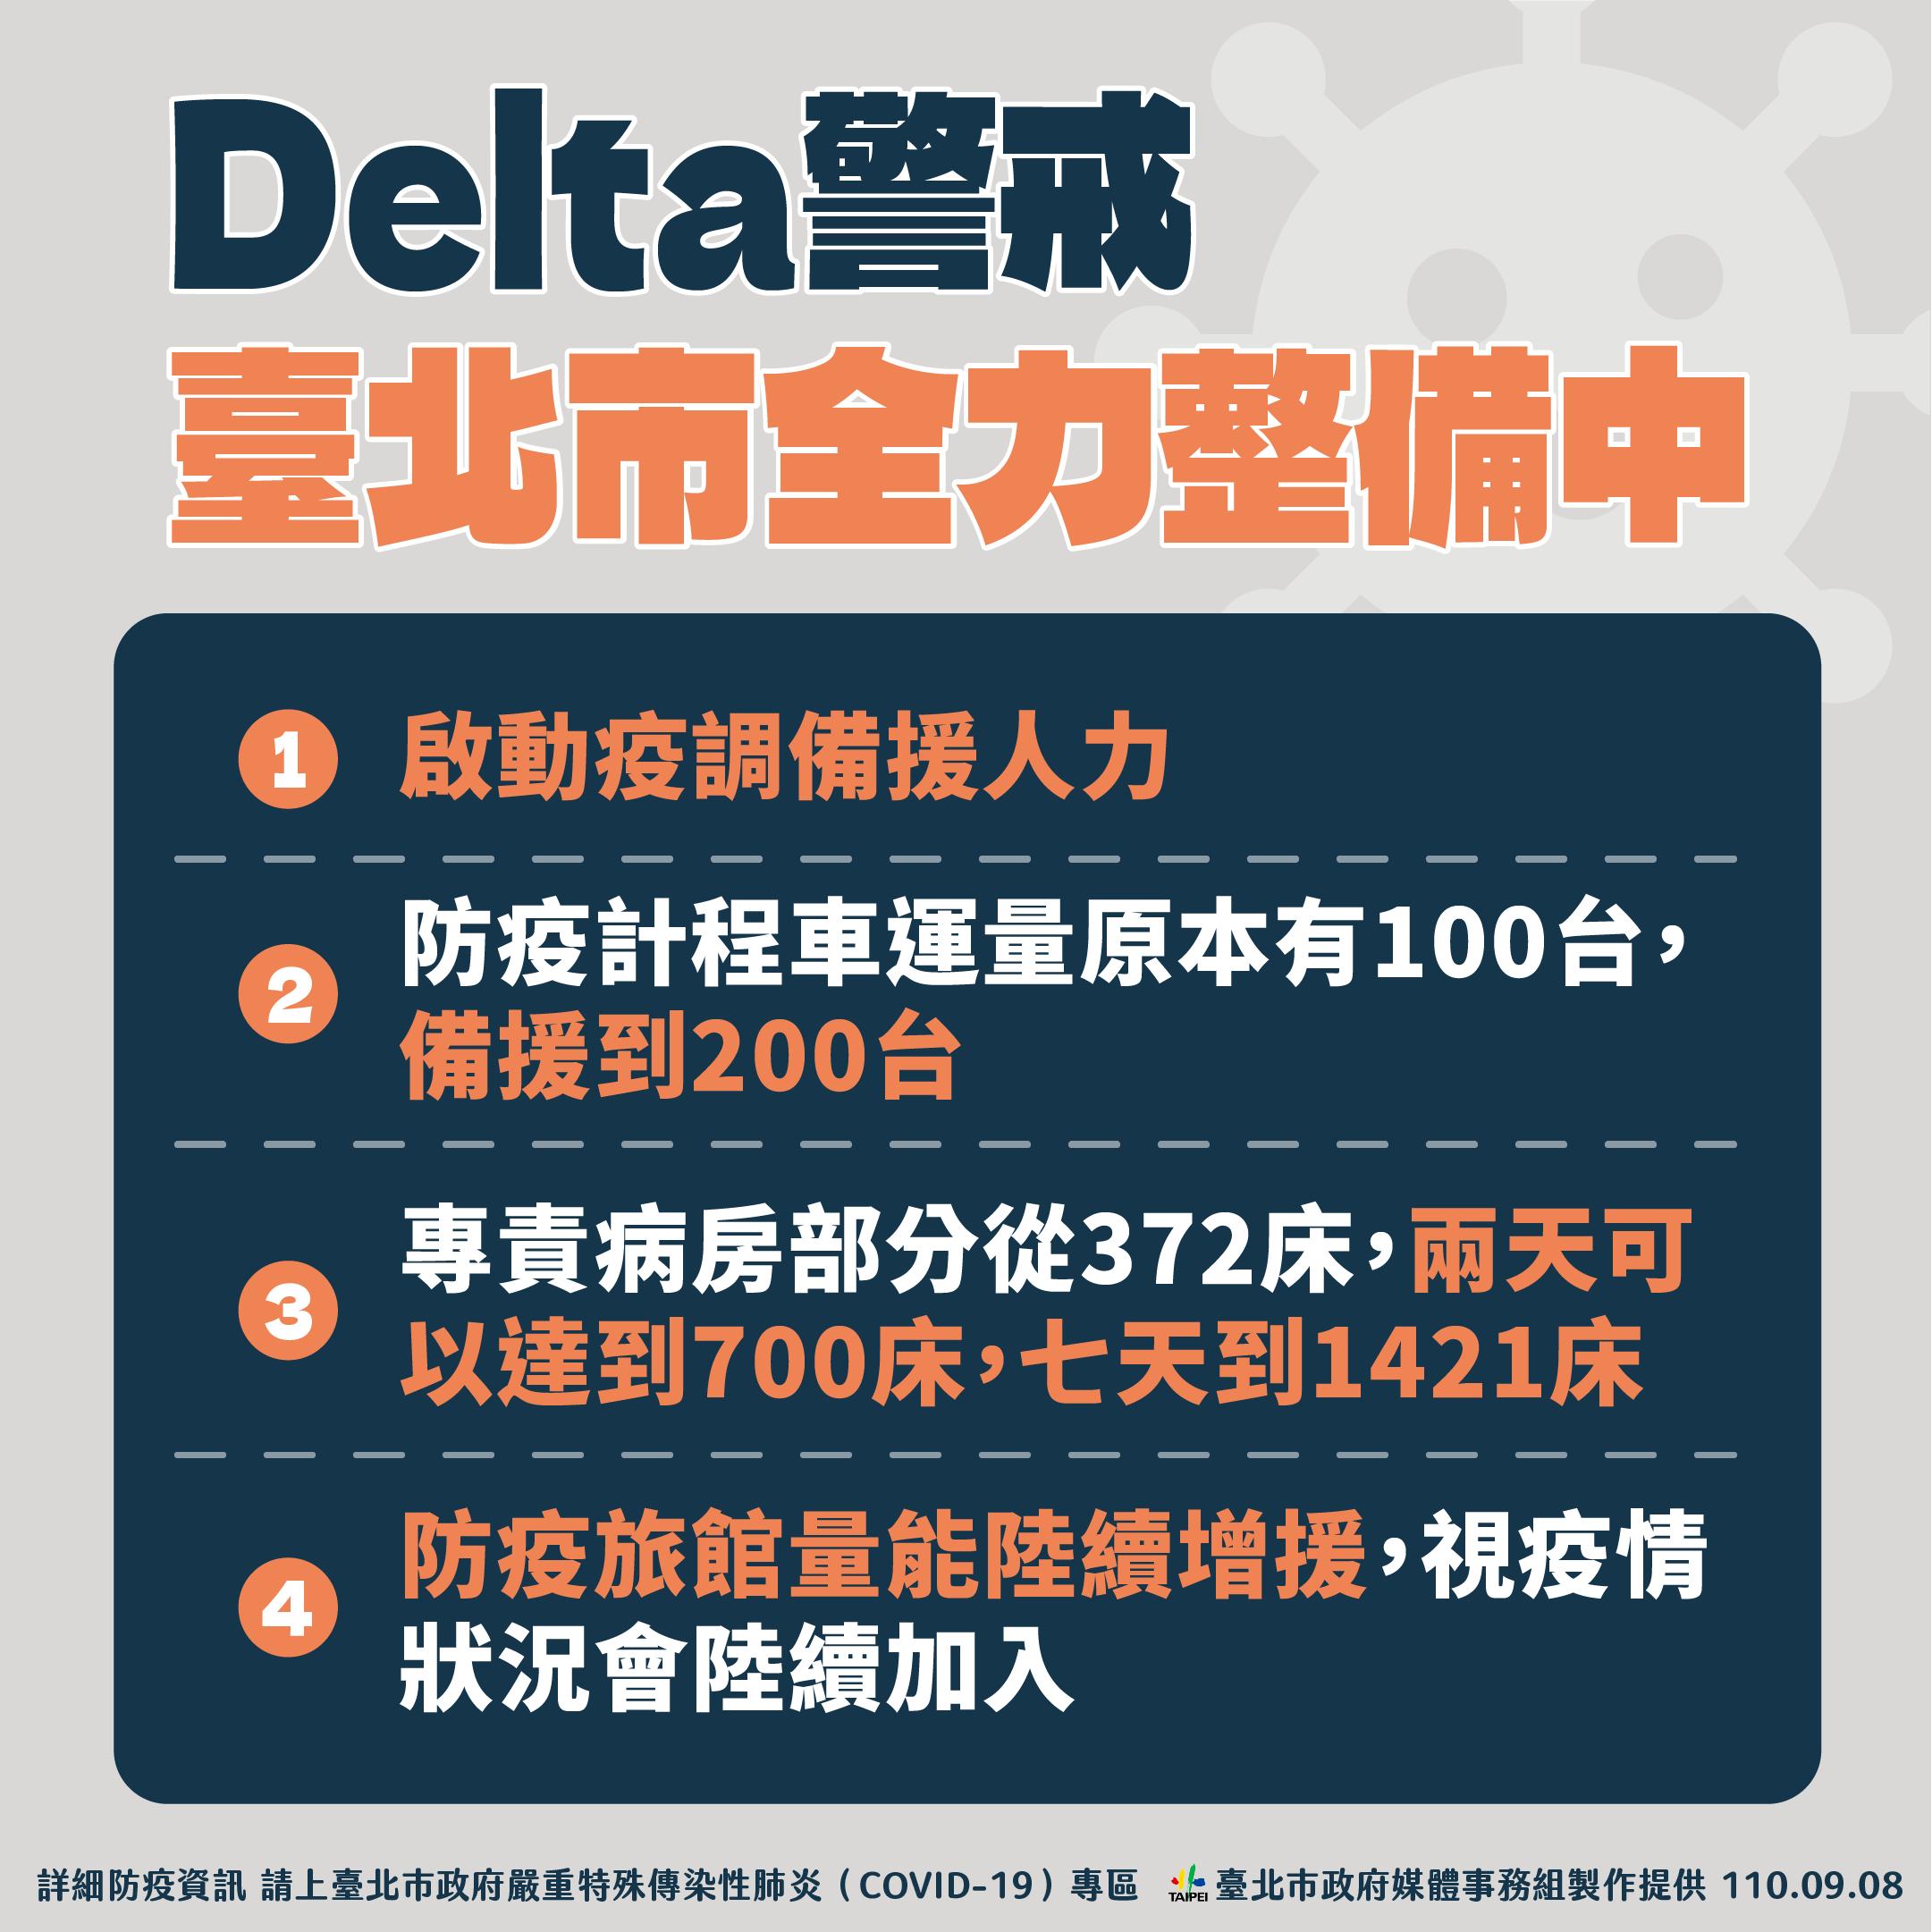 Delta警戒 臺北市全力整備